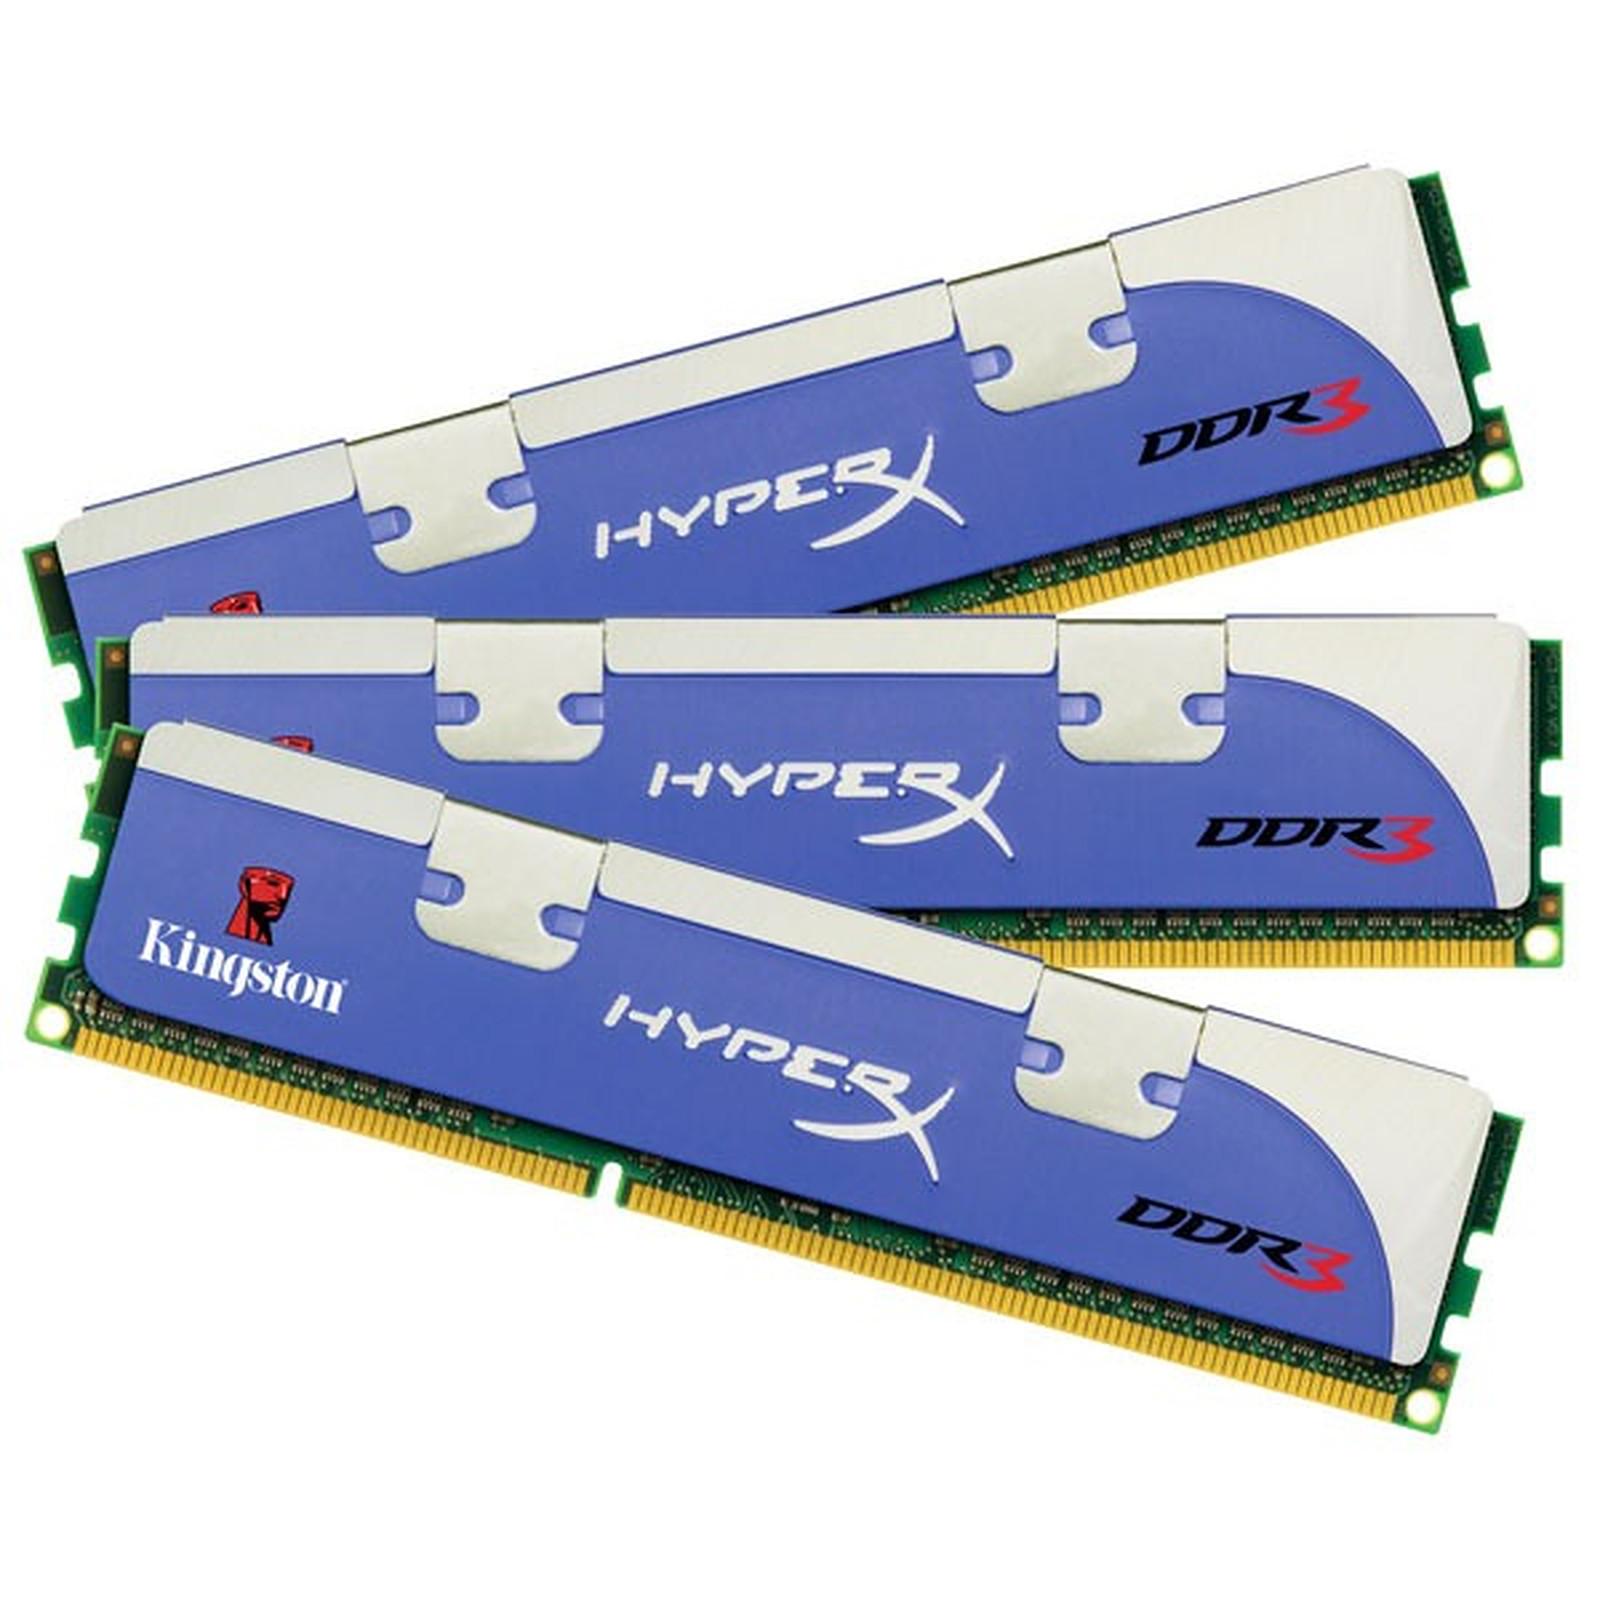 Kingston HyperX 12 Go (3x 4 Go) DDR3 1866 MHz - Mémoire PC